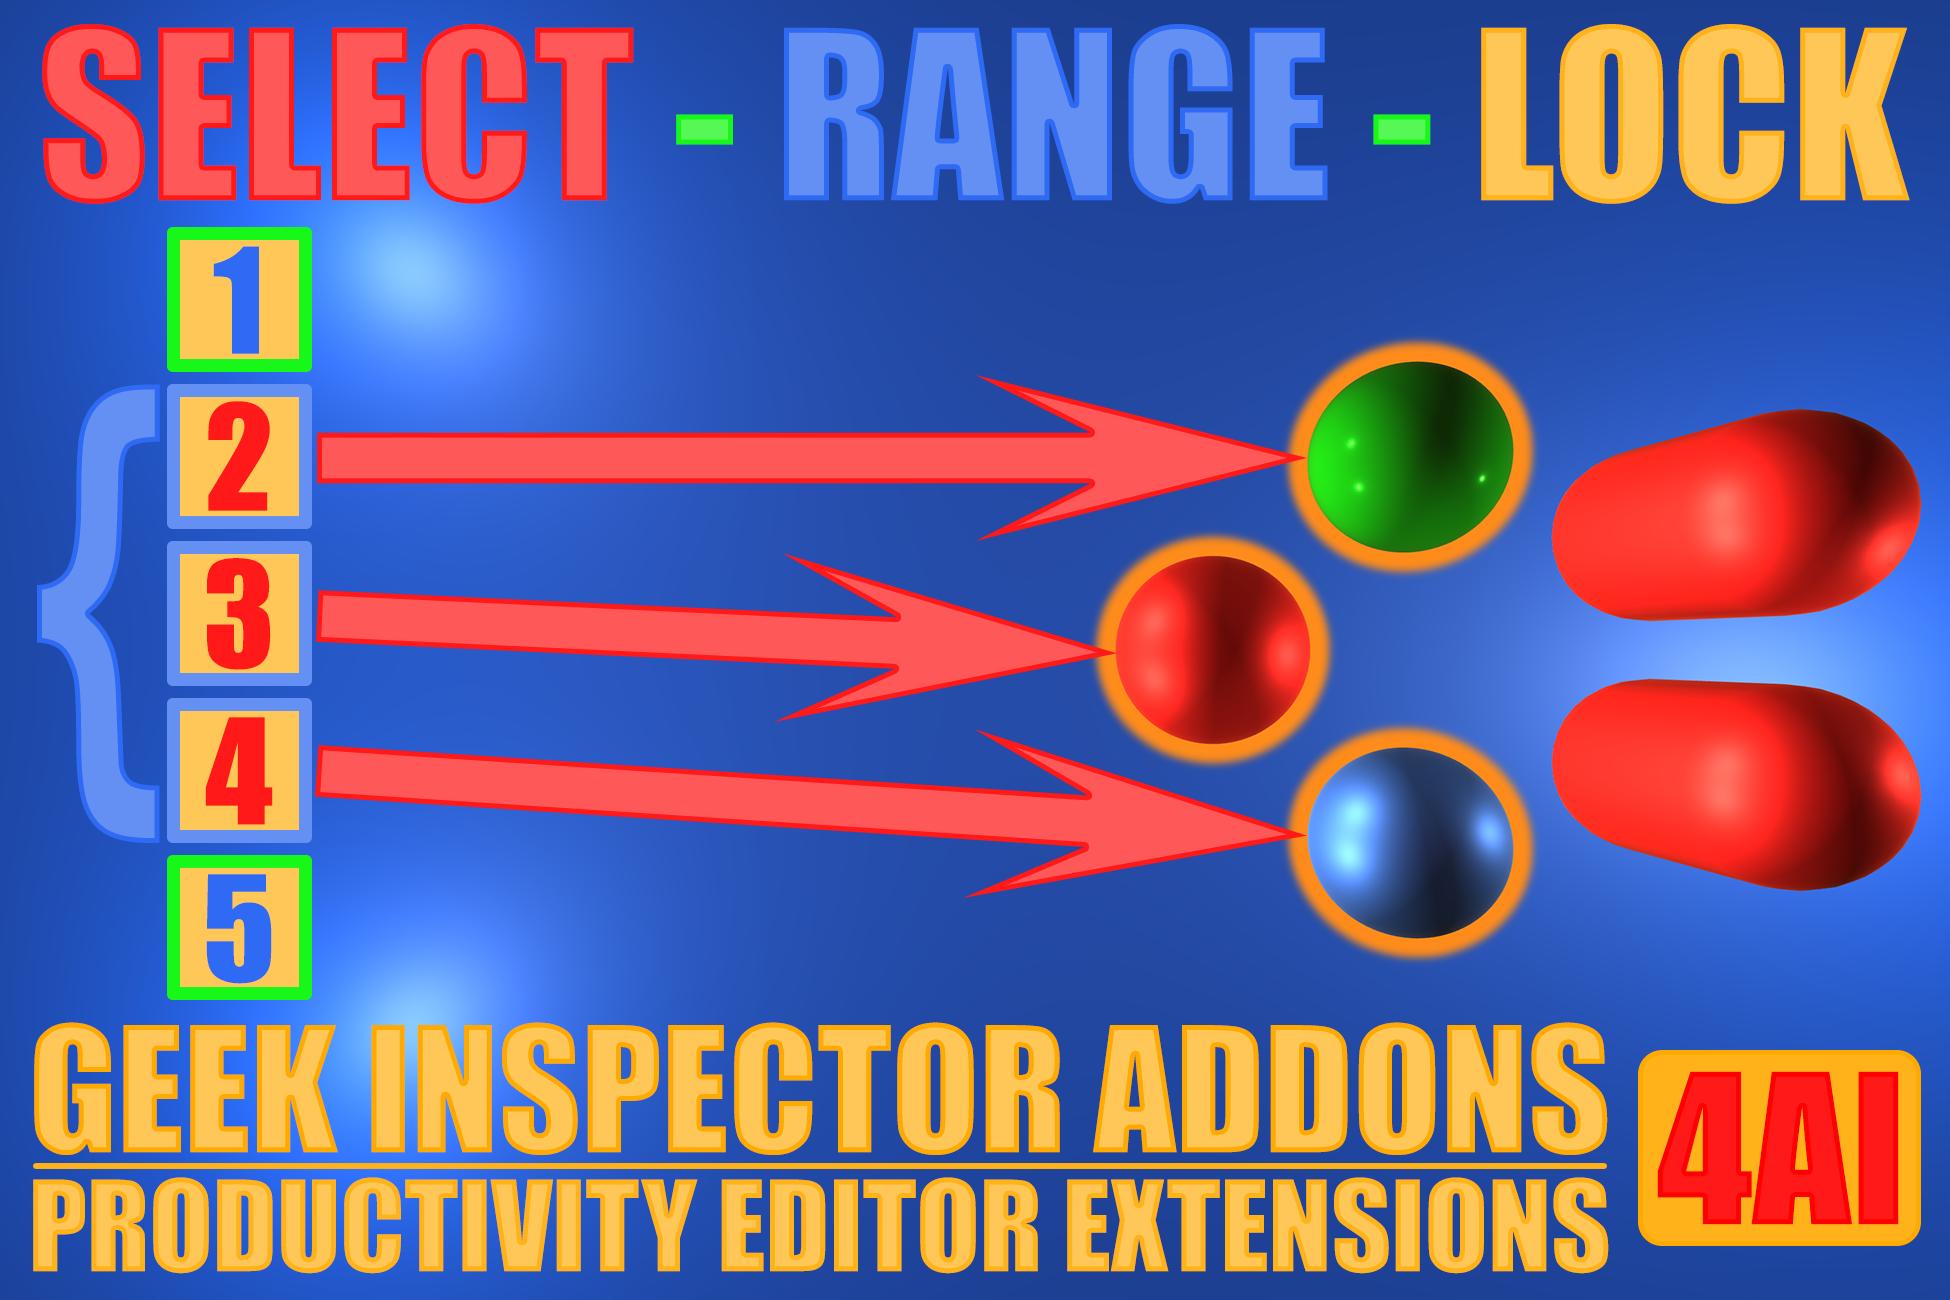 select-range-lock-CoverImage1950x1300.png